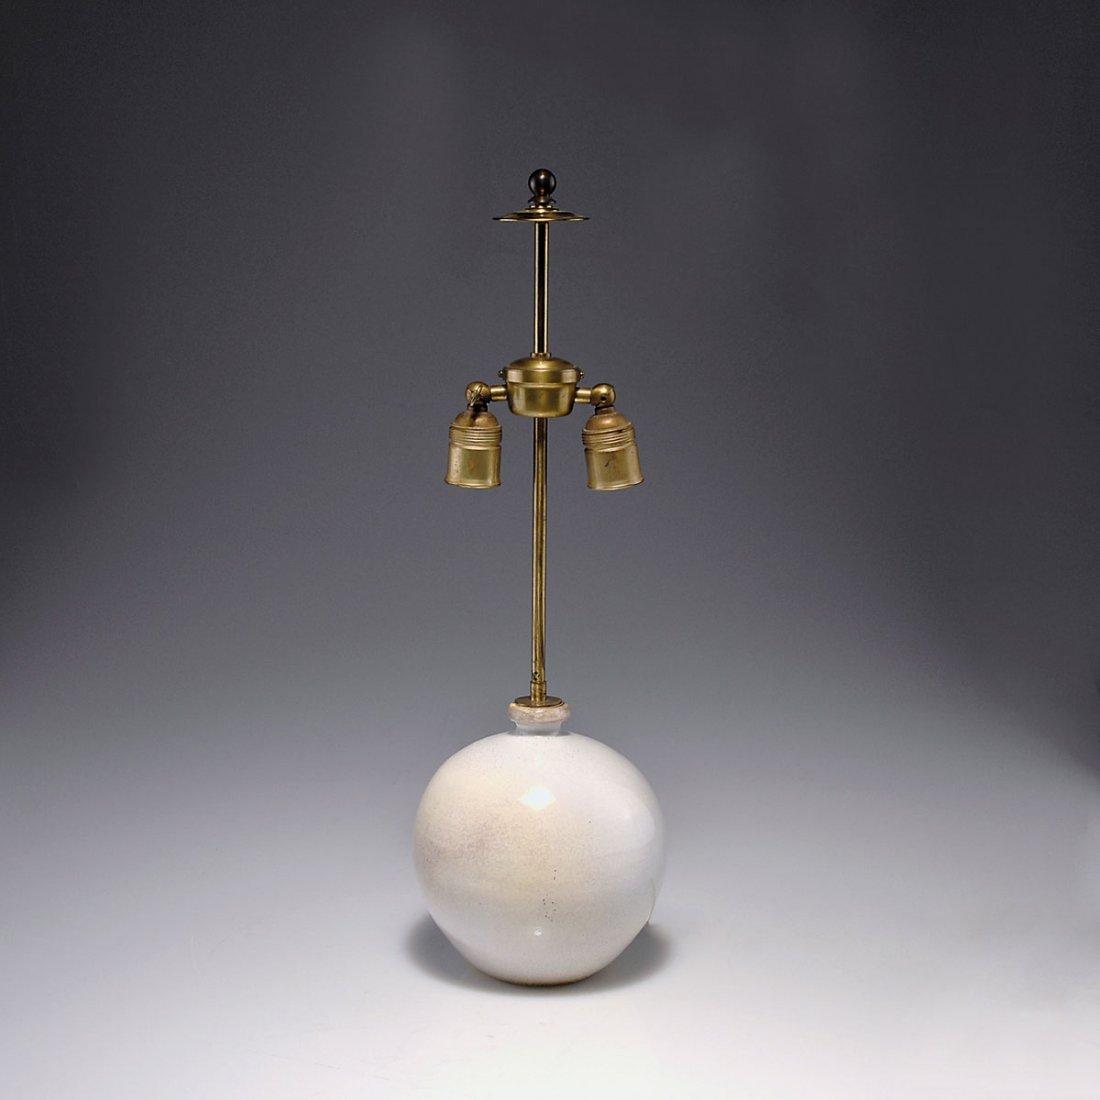 521: Table light, c1930